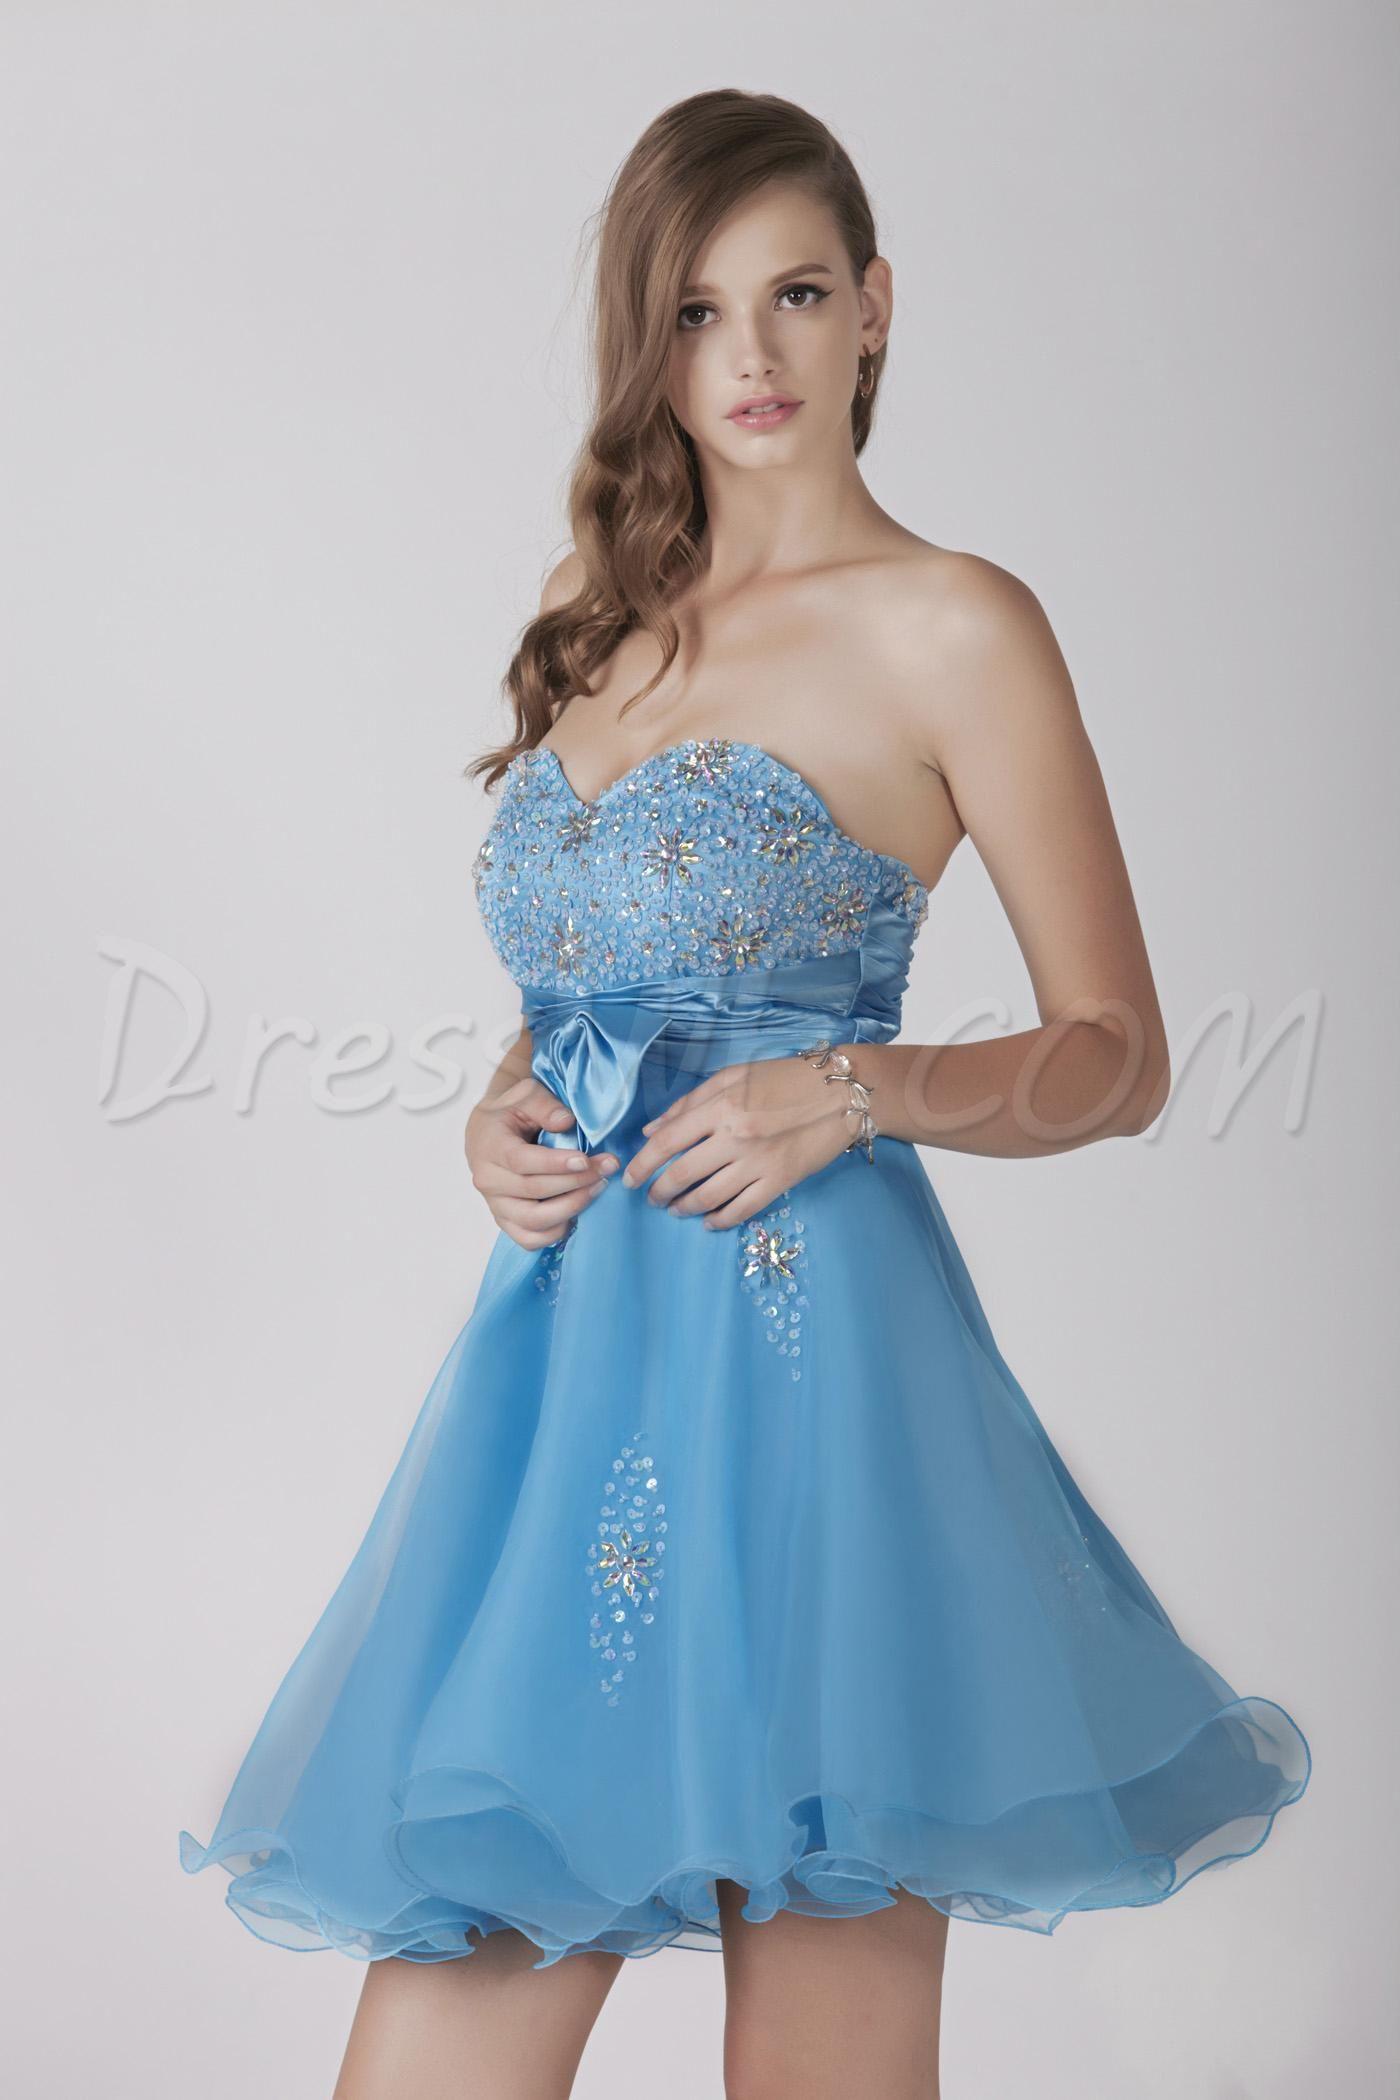 dresswe supplies sexy aline minishortlength prom dress